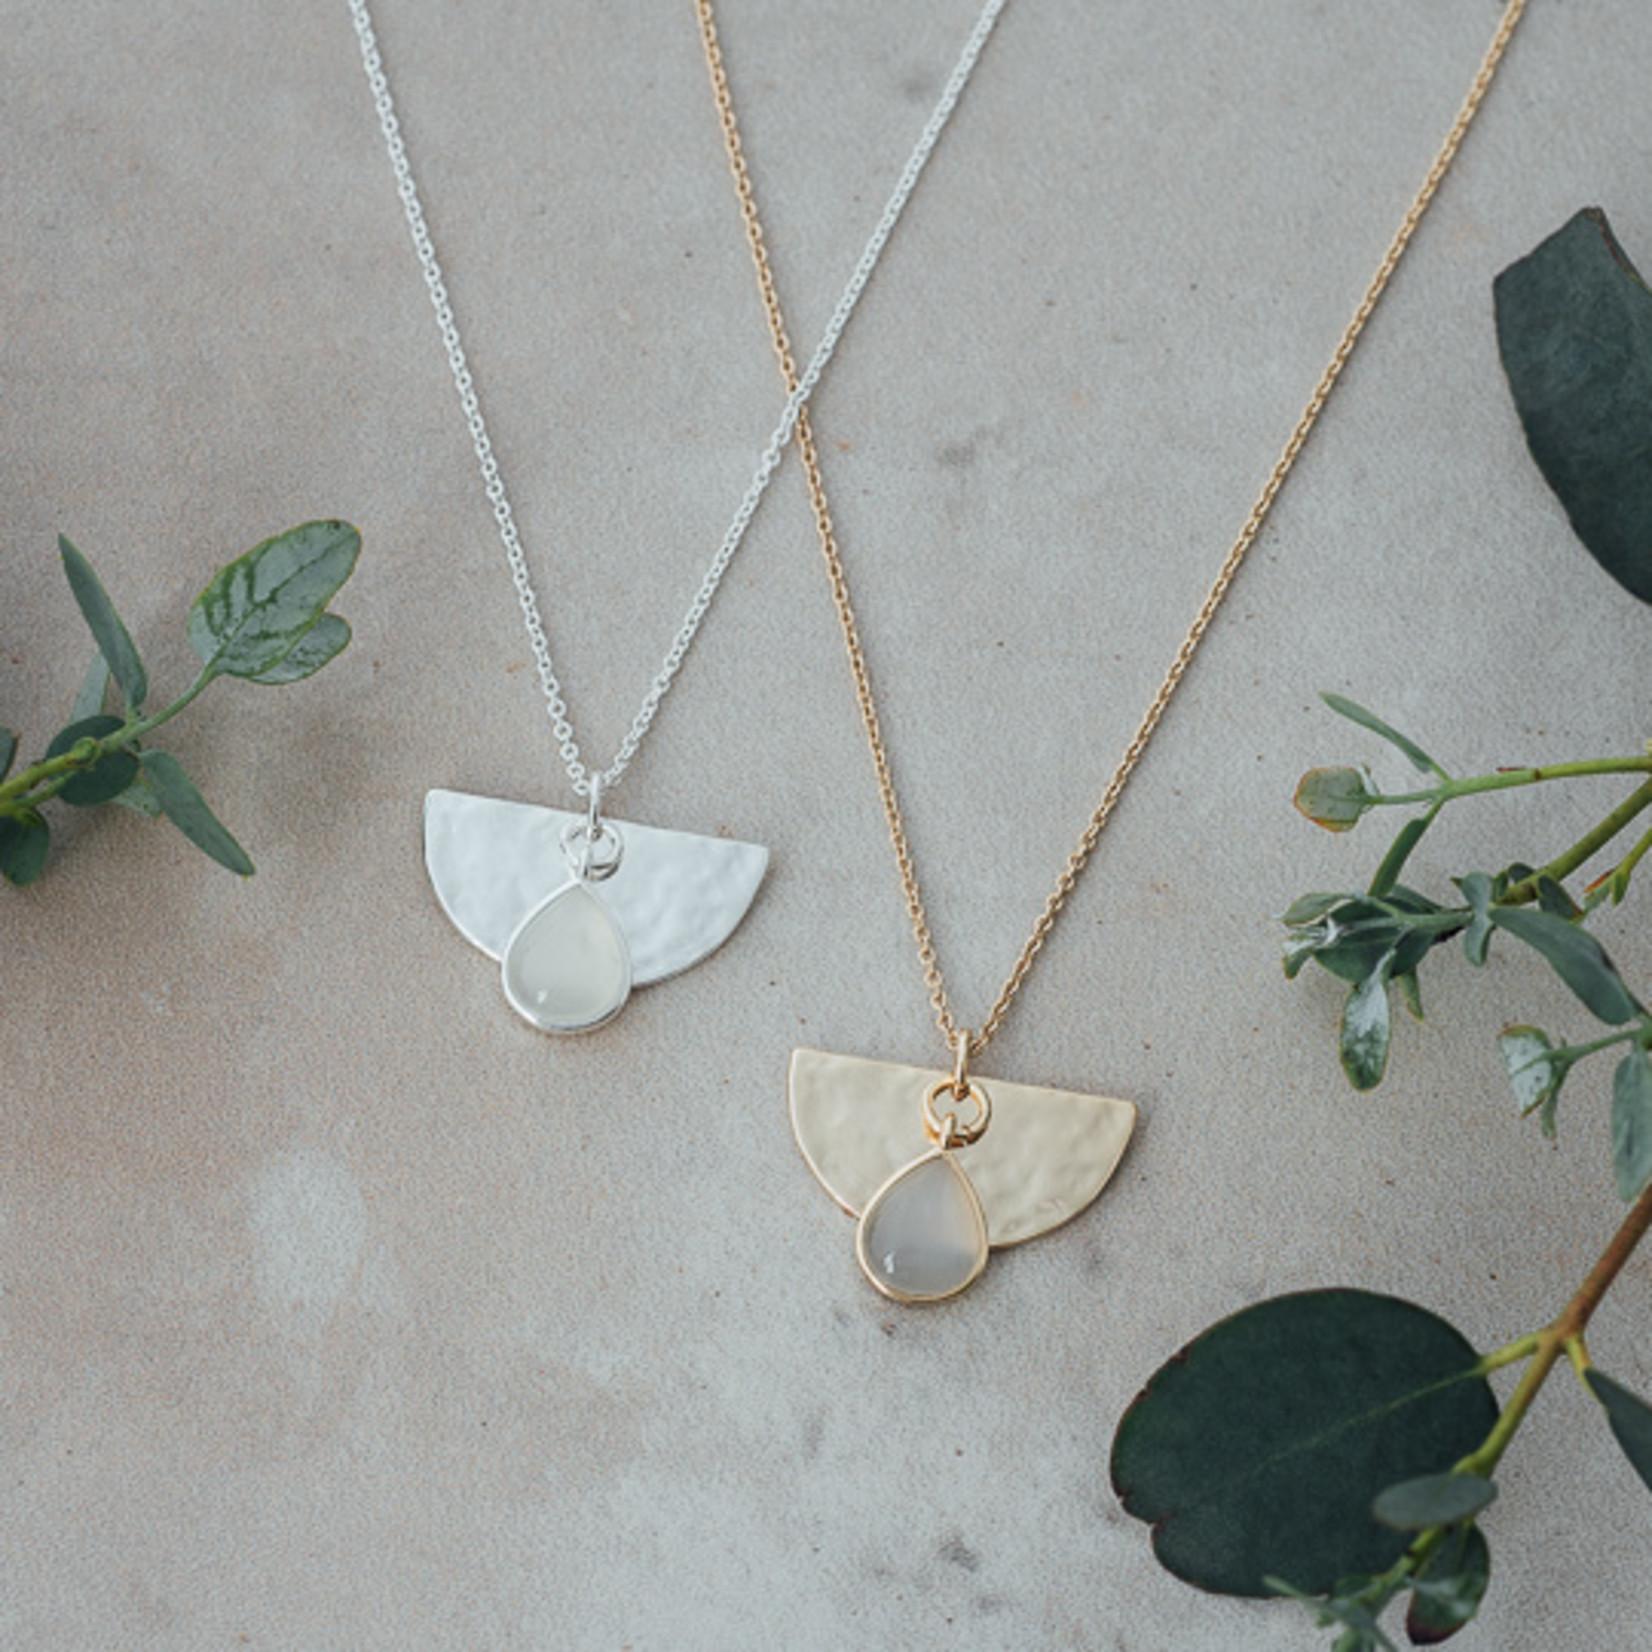 Glee Jewelry ~  Moonstone Blossom Necklace